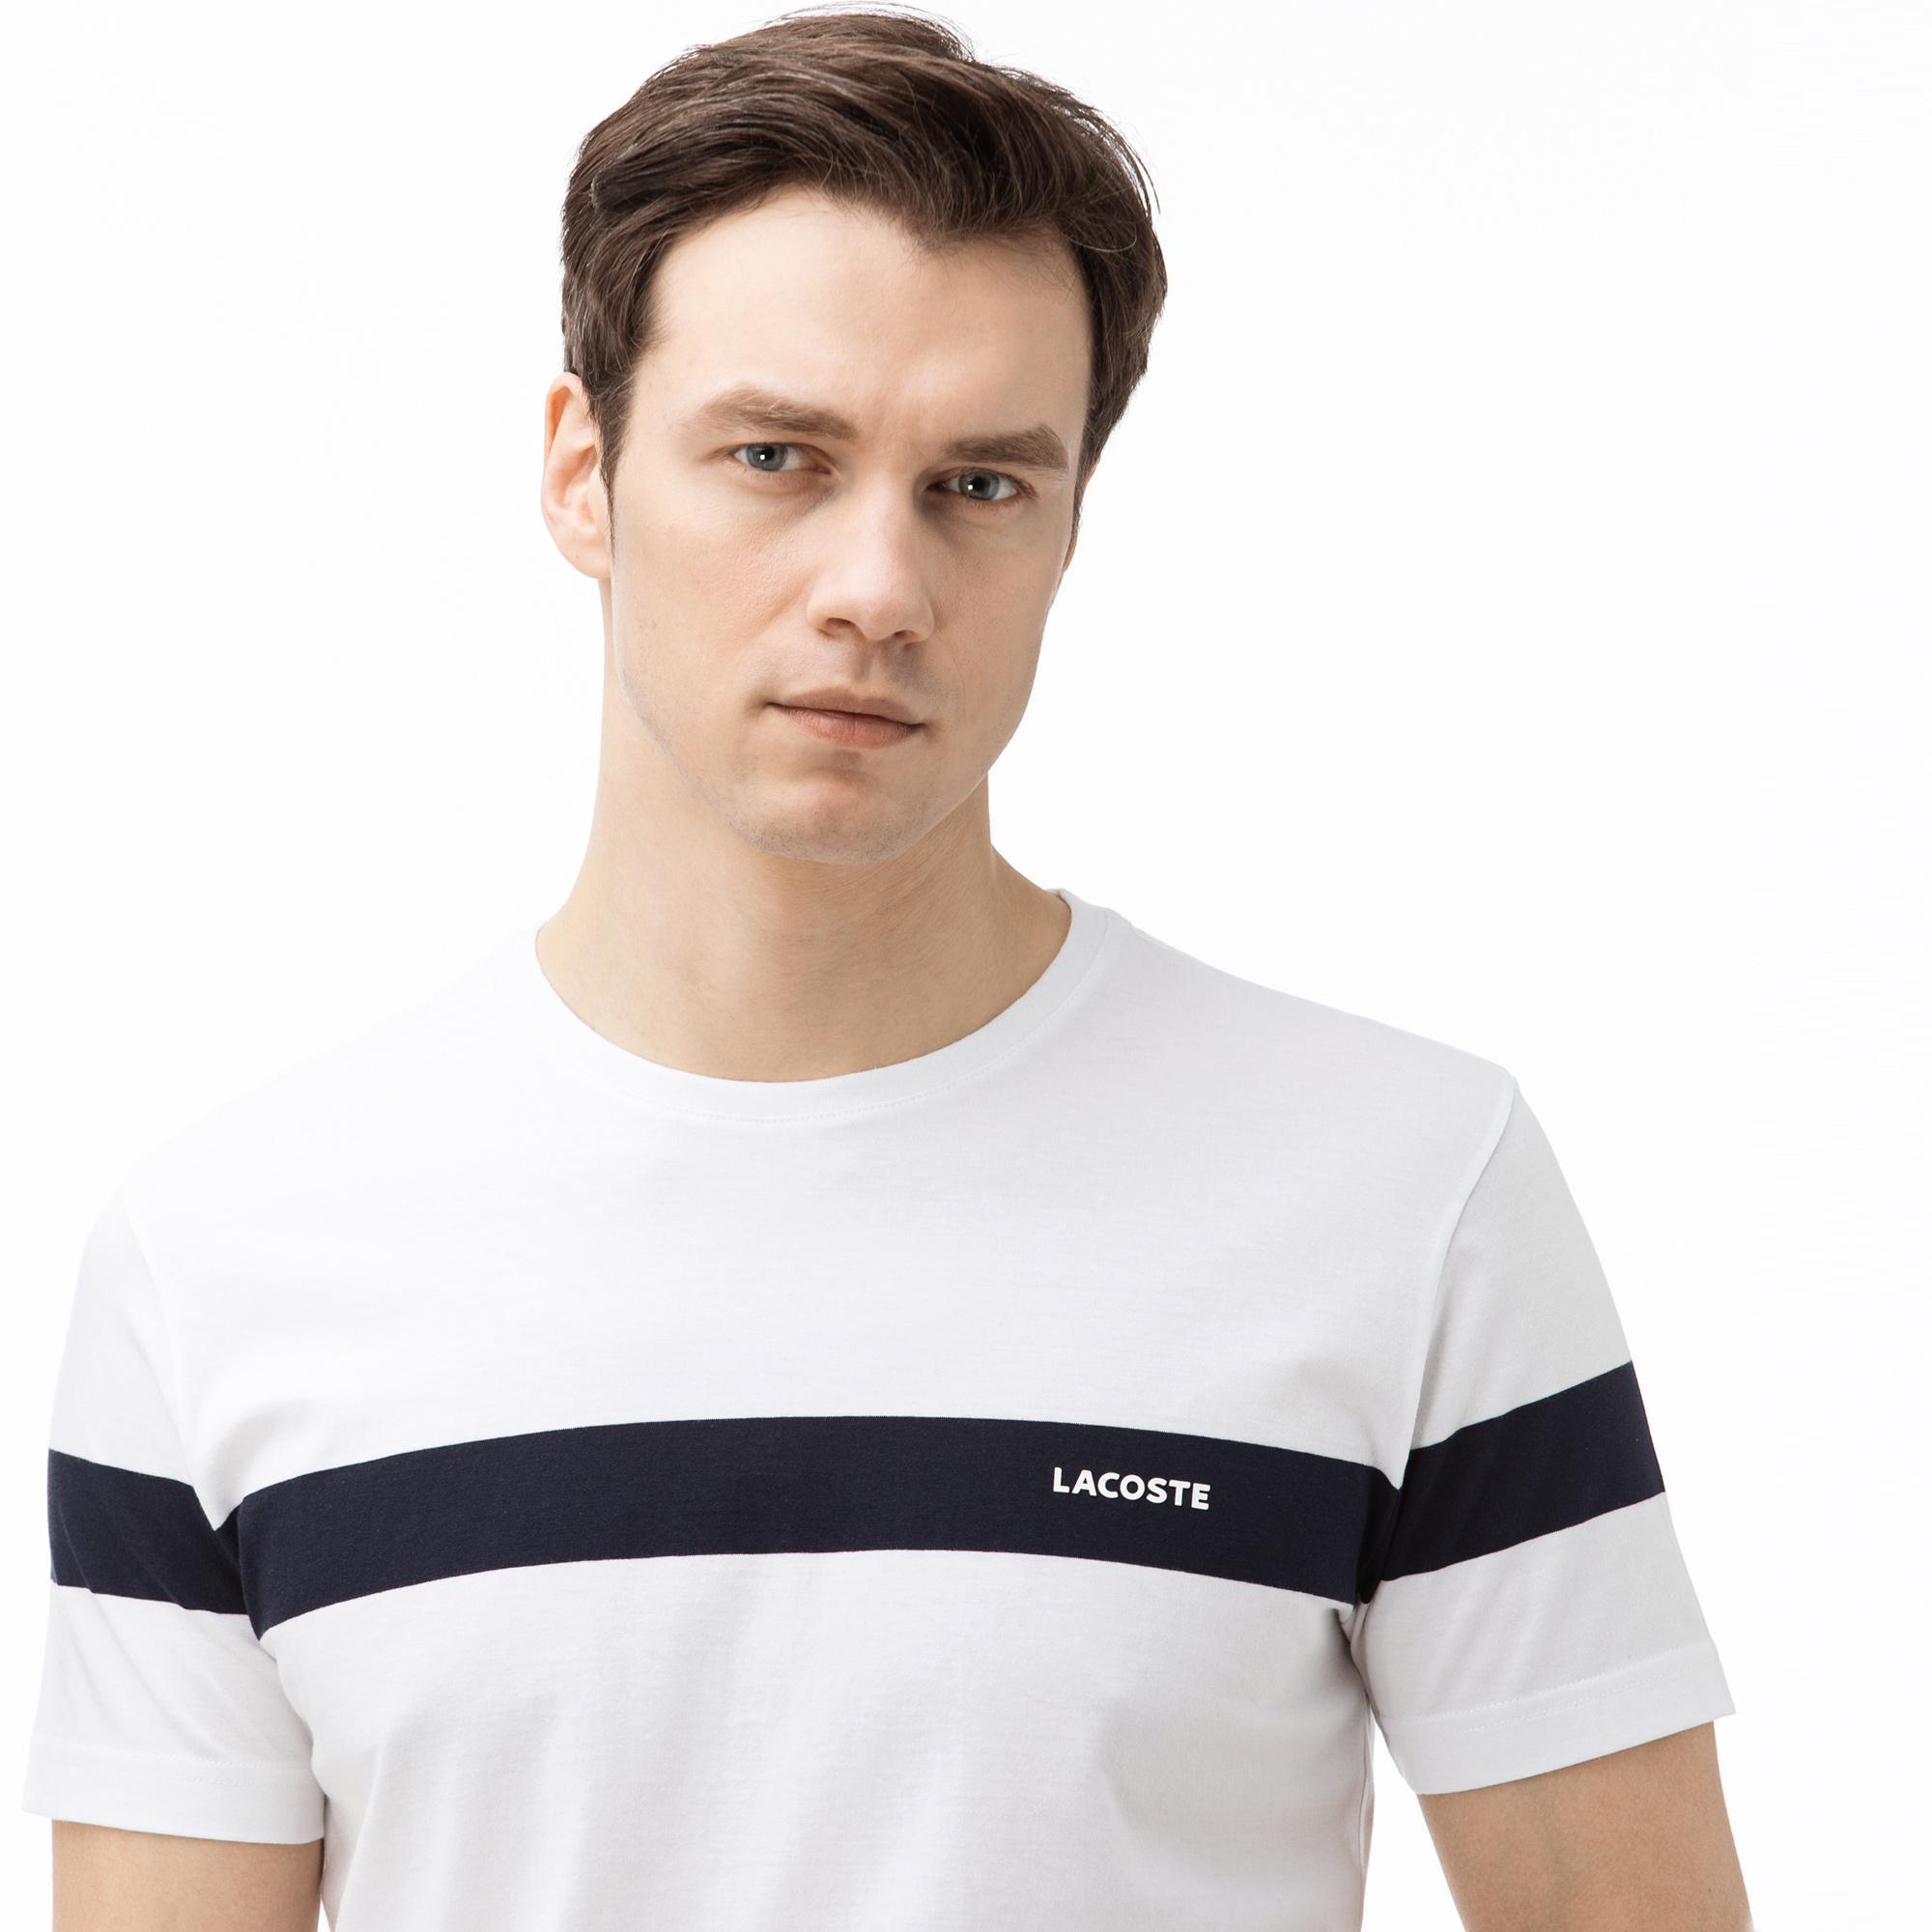 Lacoste Erkek Bisiklet Yaka Çizgili Beyaz T-Shirt